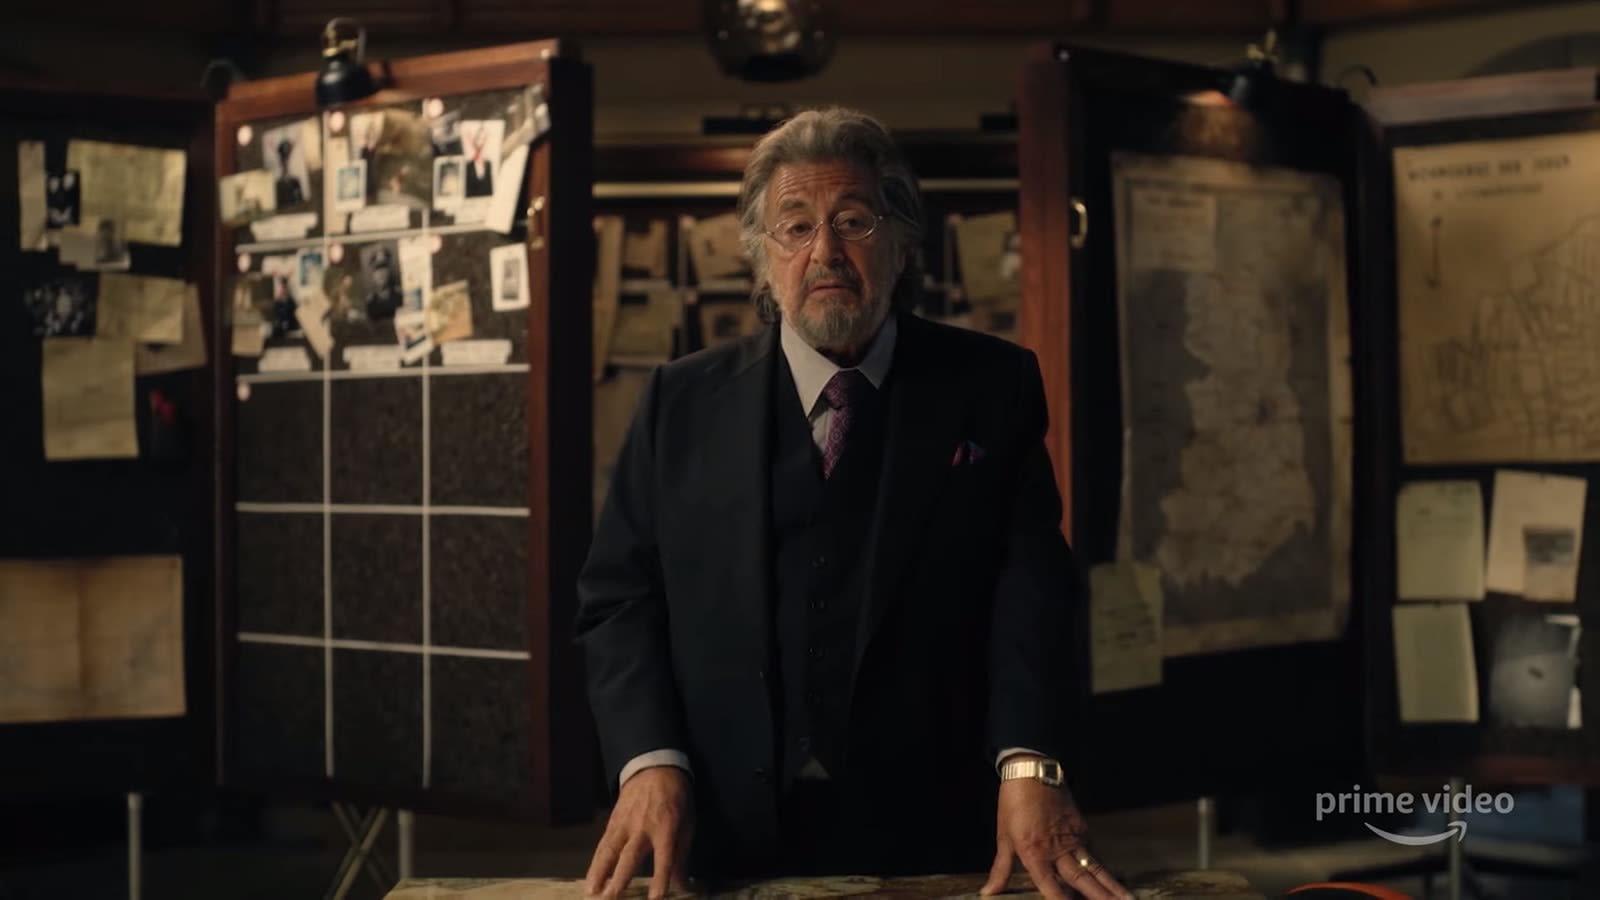 Watch Al Pacino hunt Nazis in Jordan Peele's upcoming Amazon series